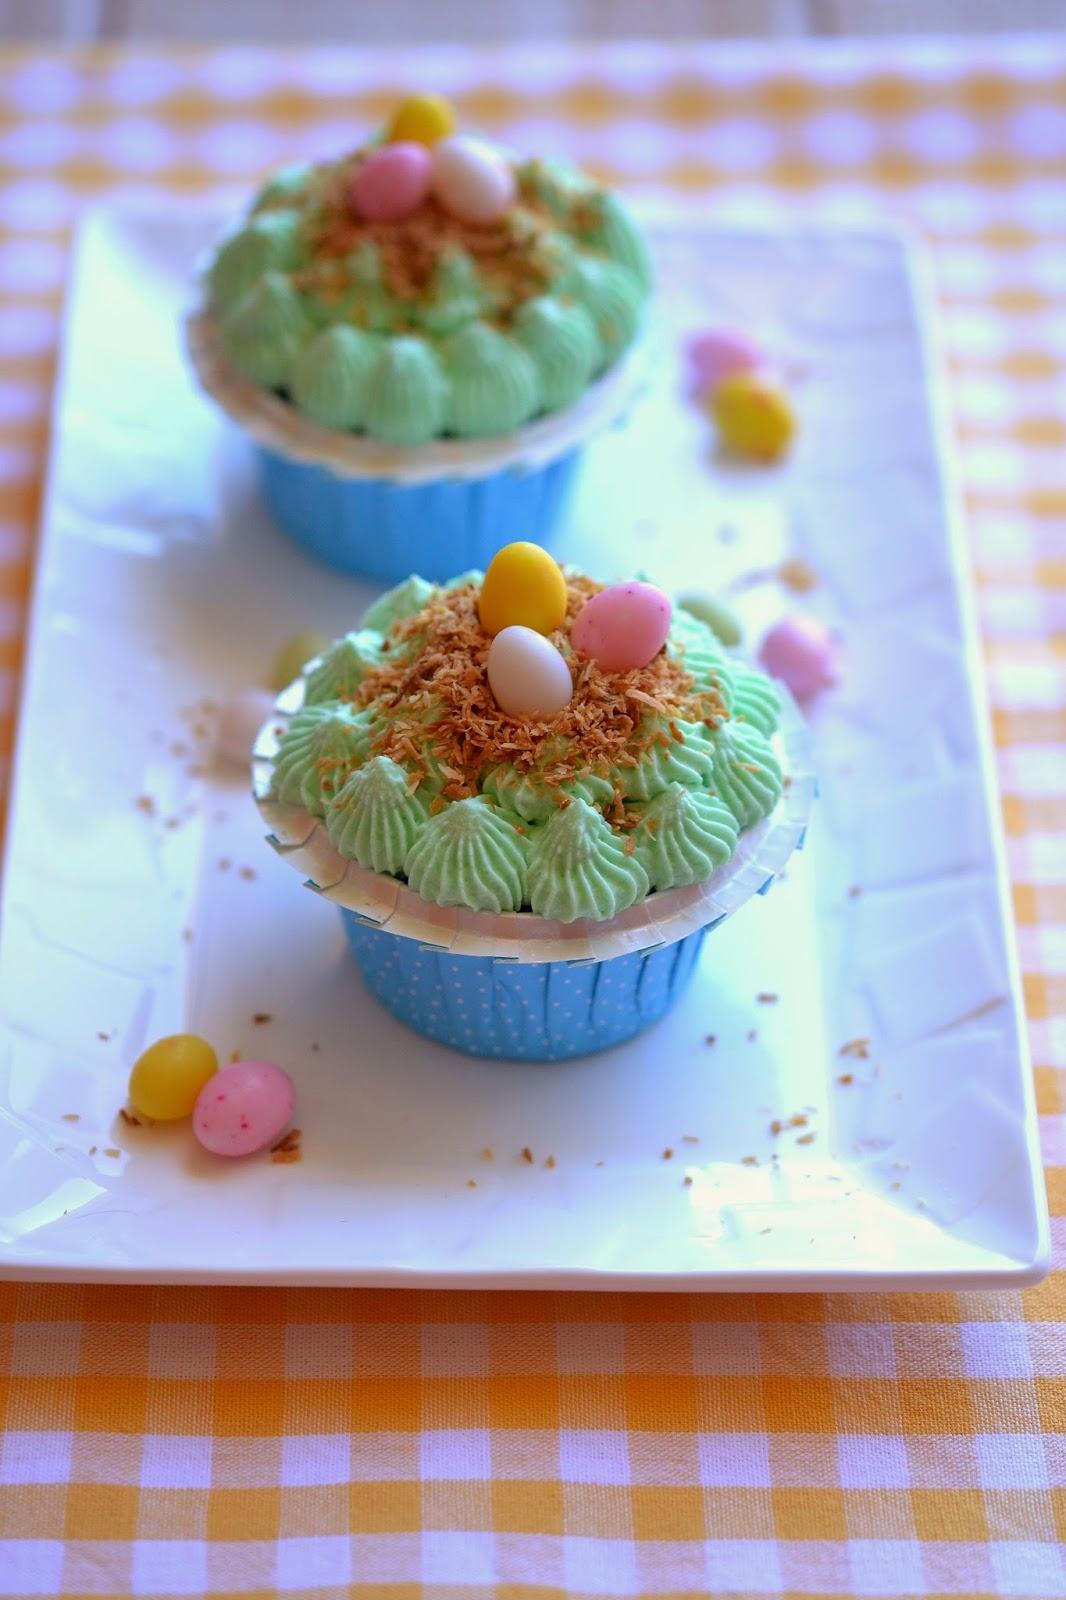 Cupcakes nid de Pâques Fromage ou Dessert ? Dessert !!!